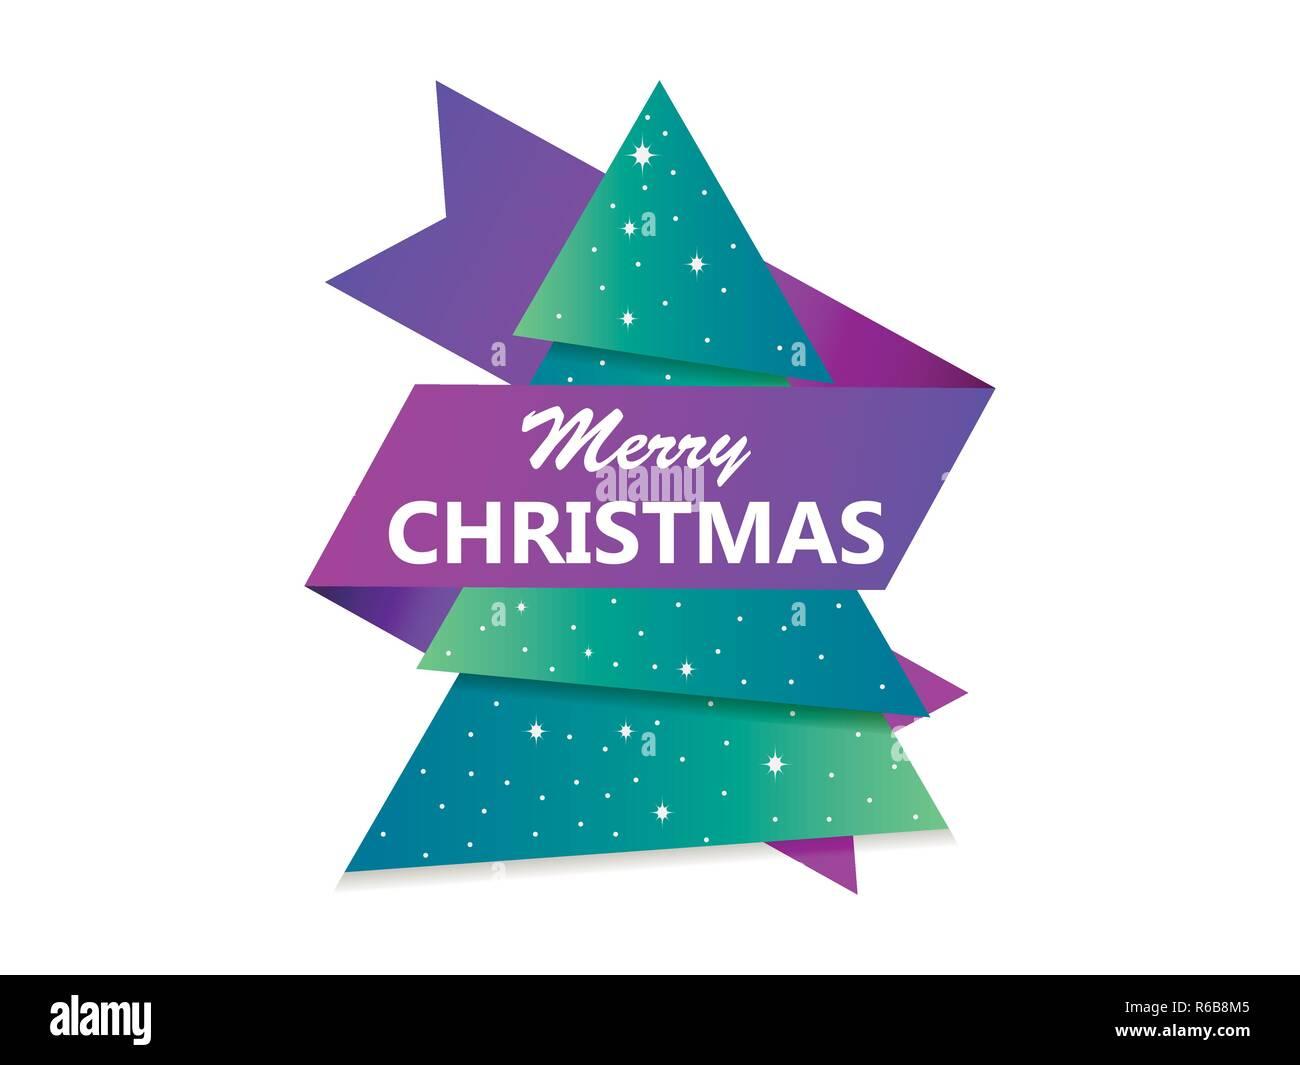 Merry Christmas Greeting Card Albero Di Natale Con Nastro Carta